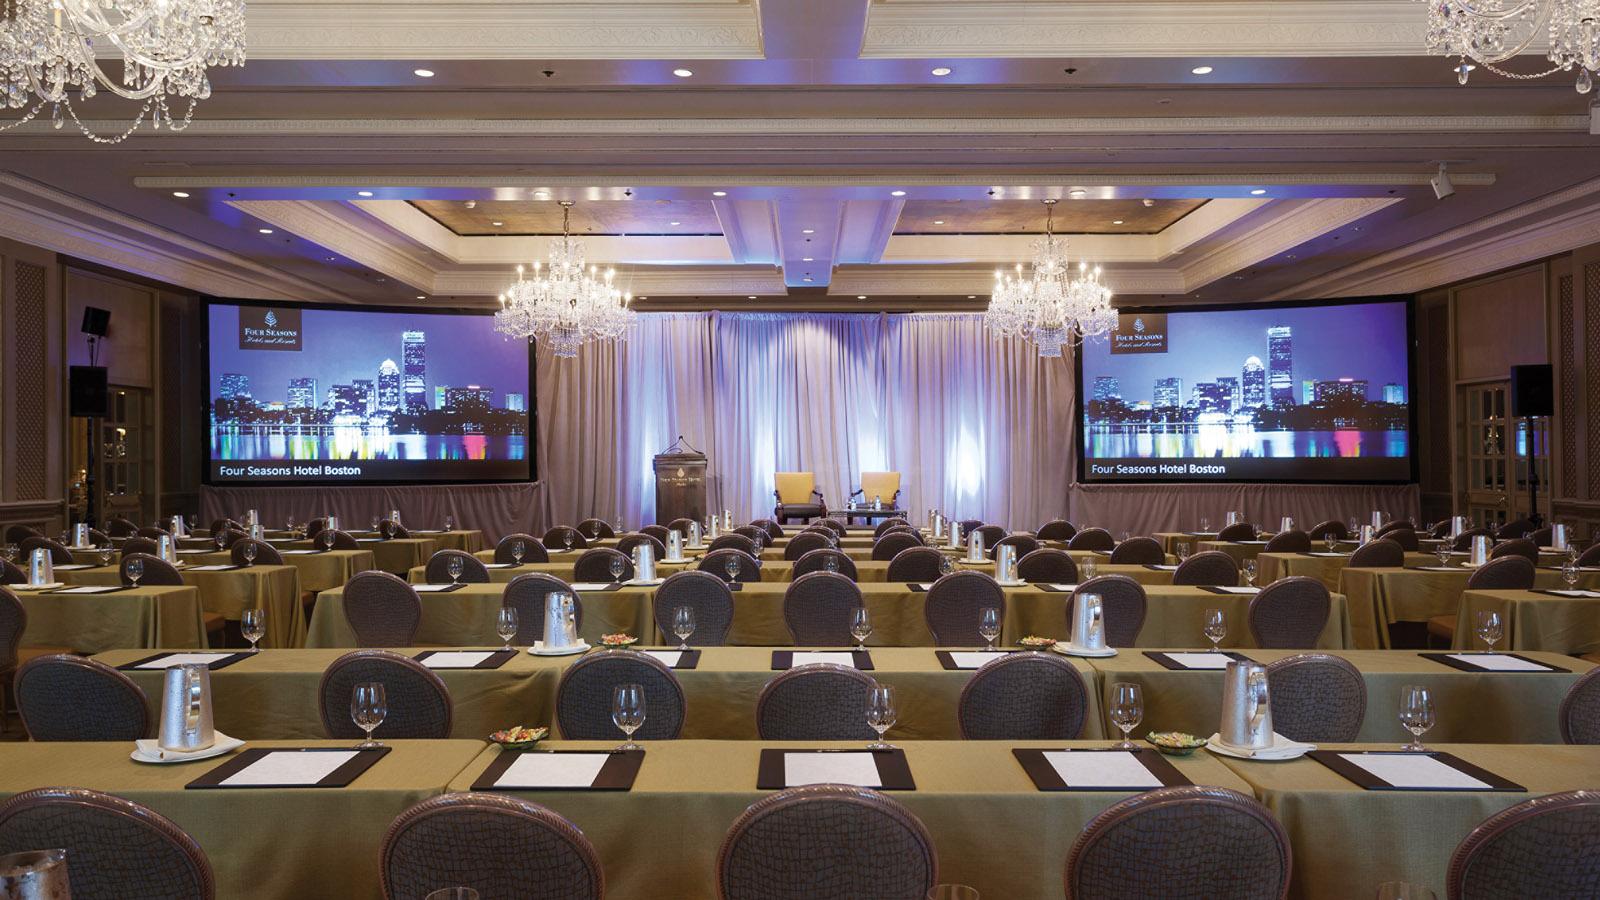 Boston Meeting Space Event Venues: Boston Meeting Space & Event Venues